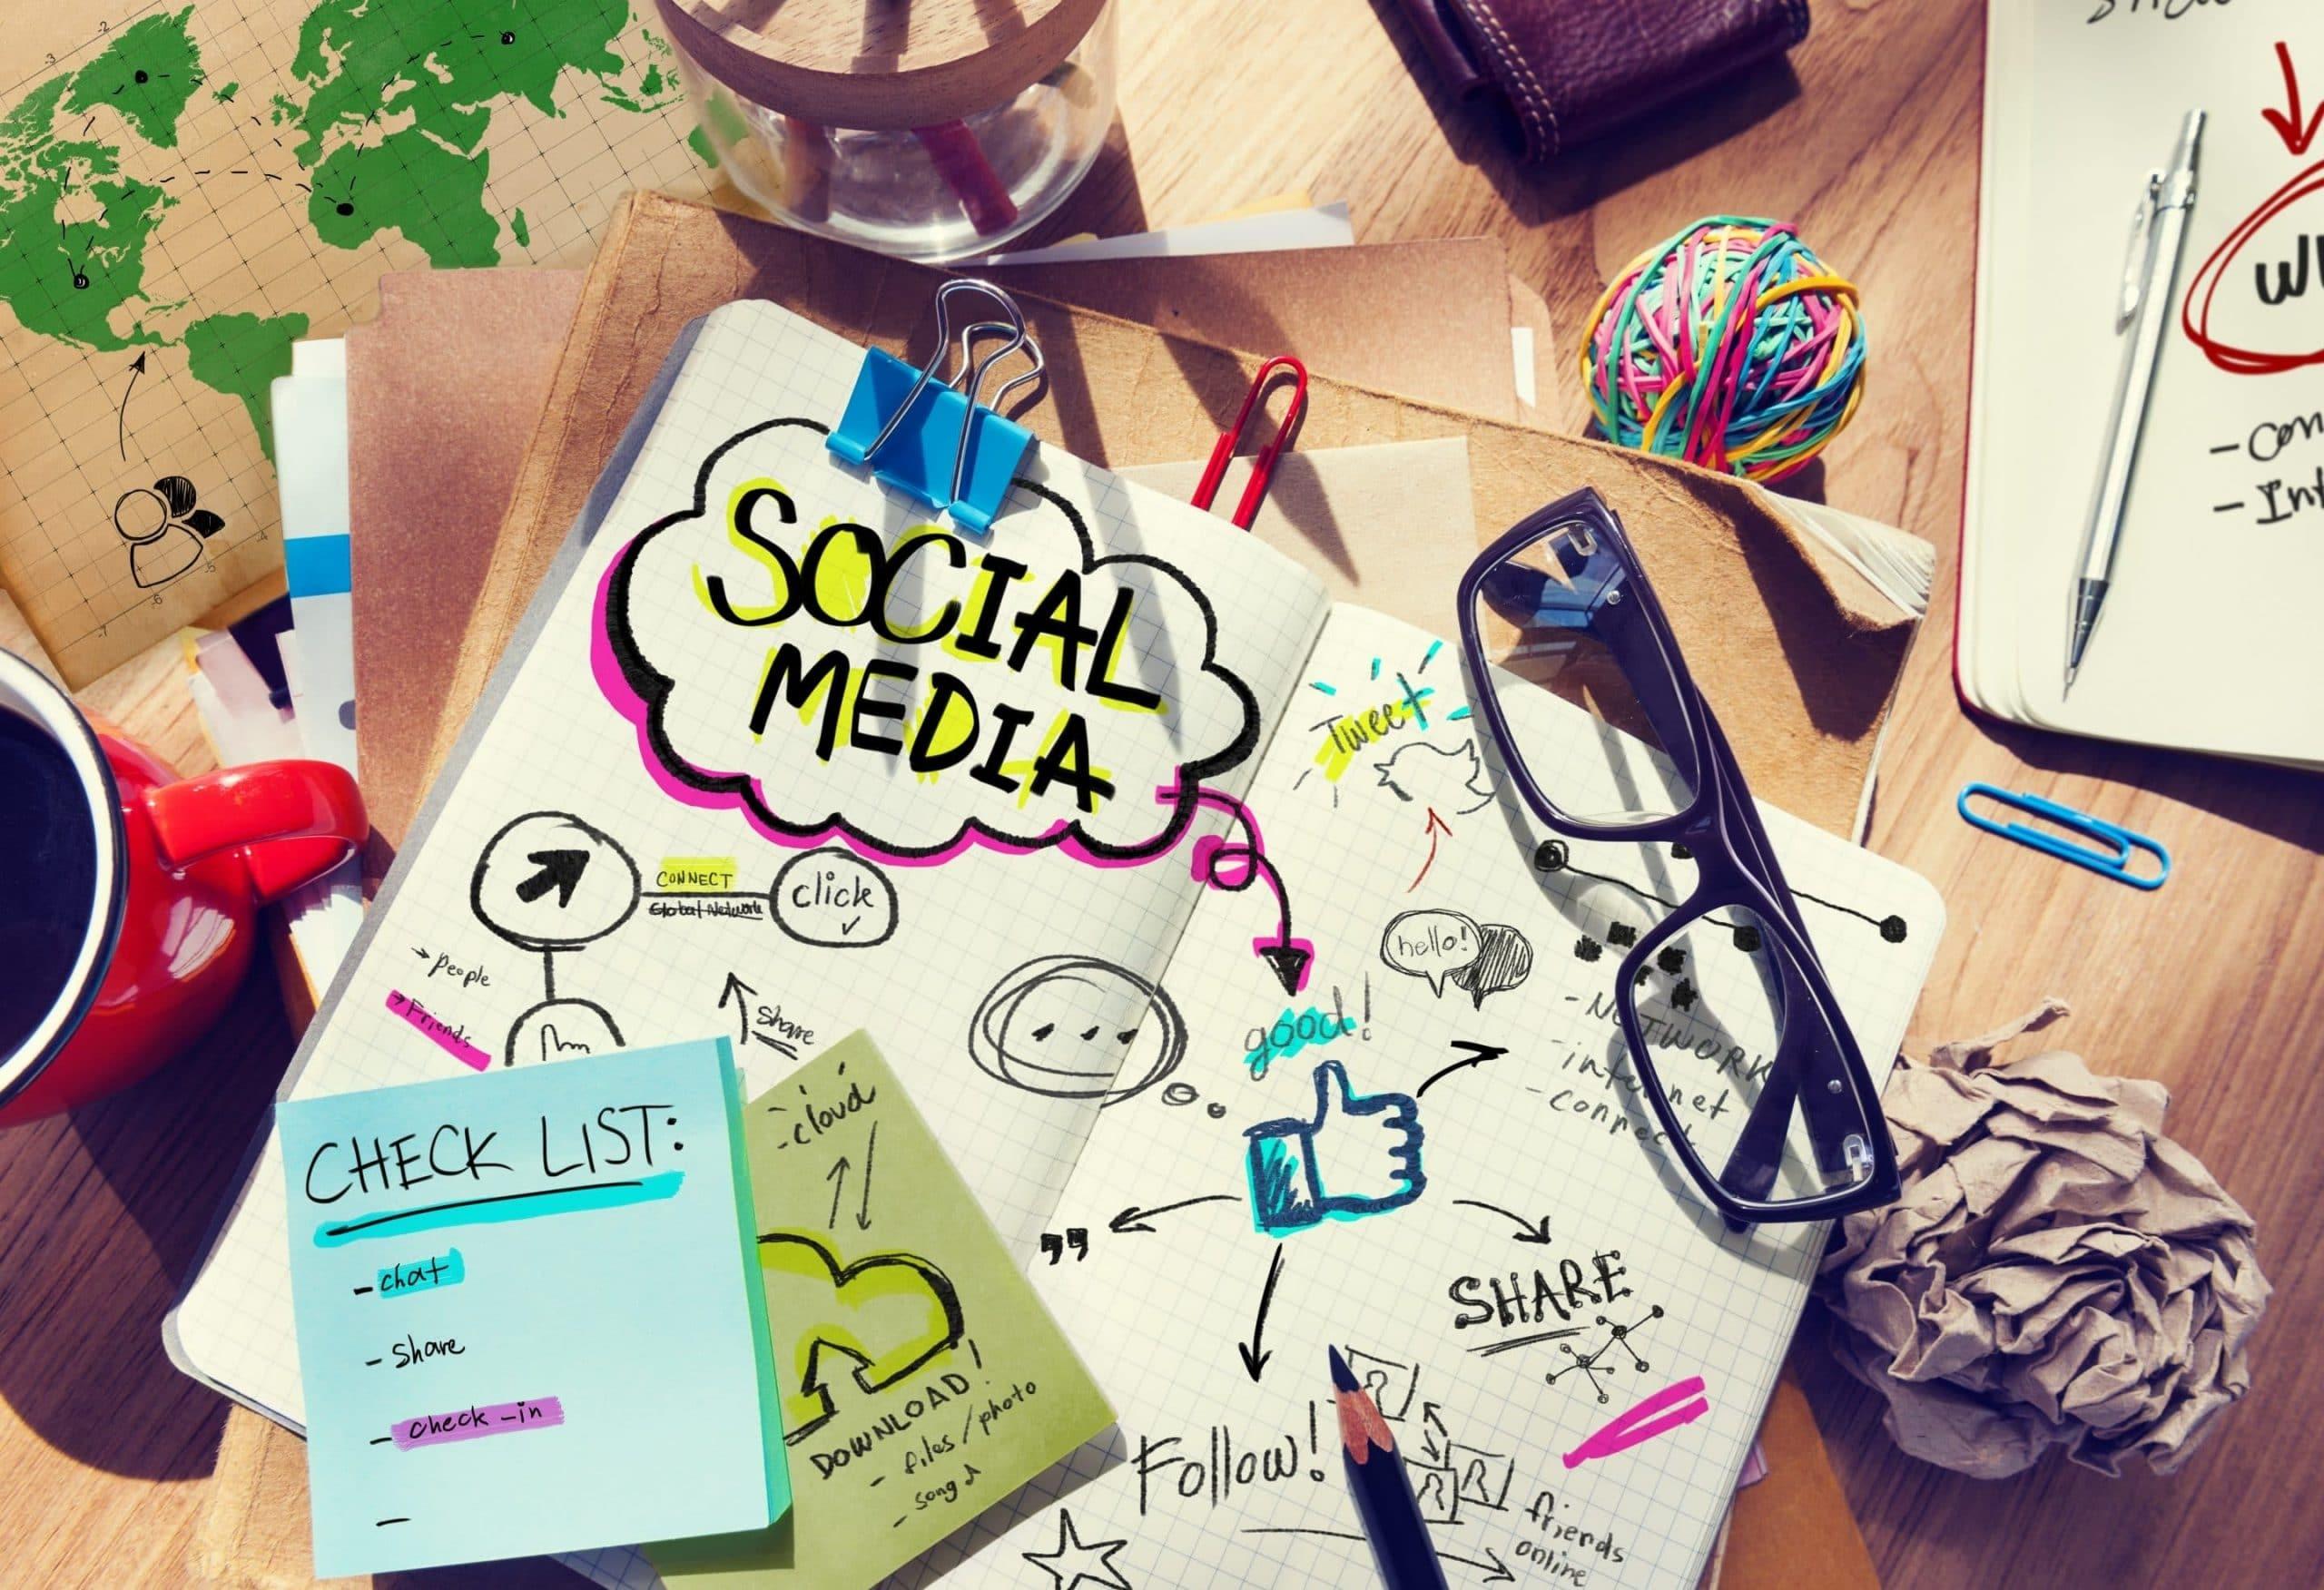 Social Media de Basis